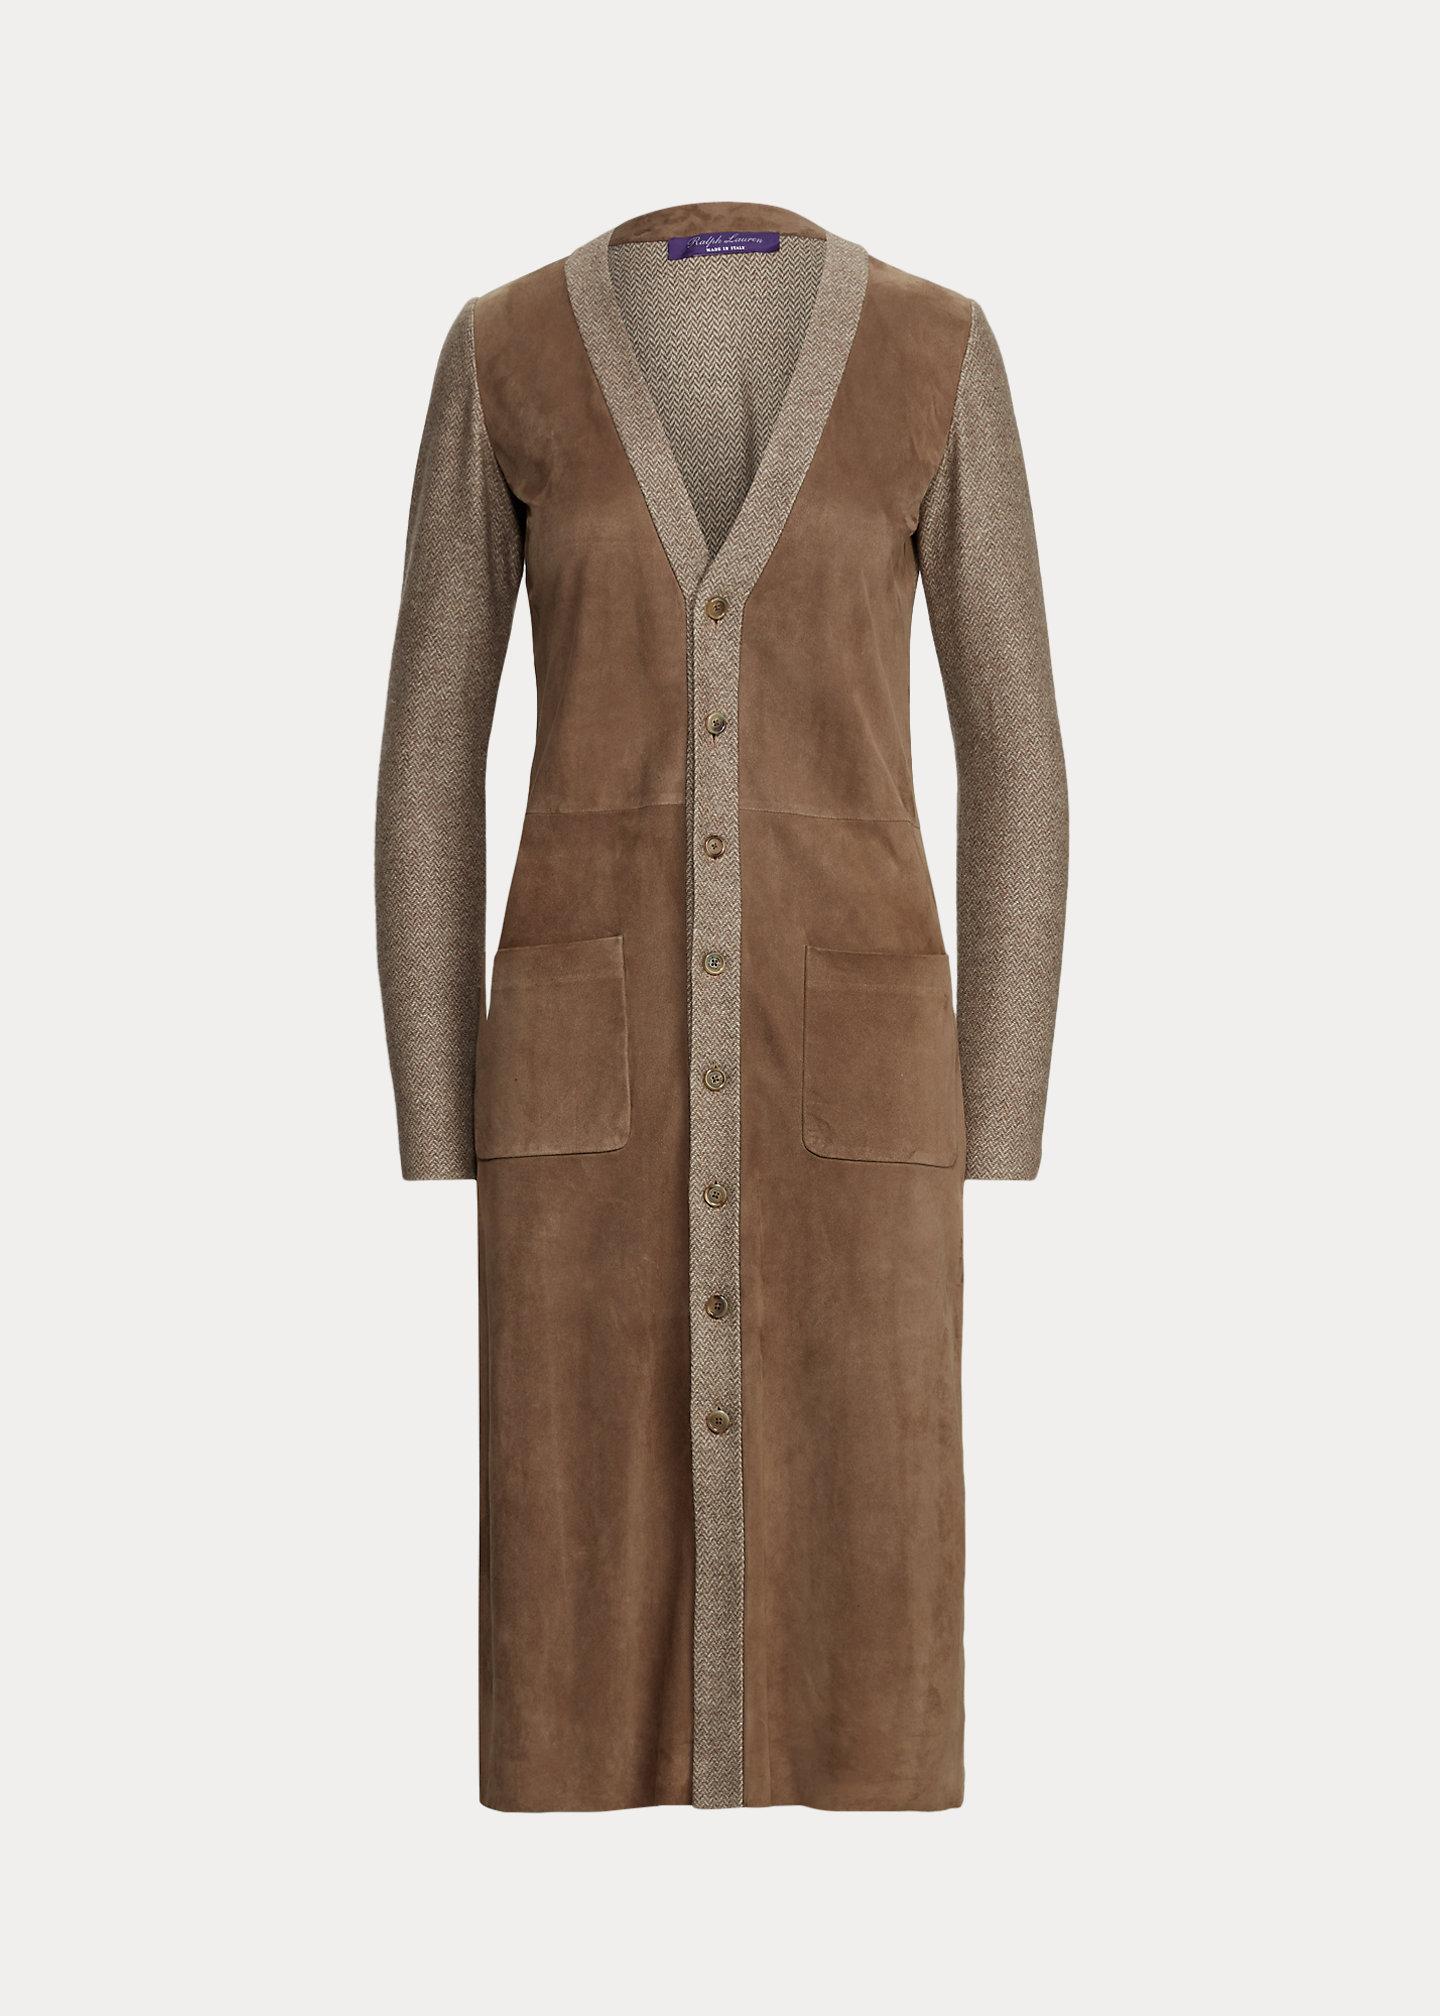 Ralph Lauren Collection Alivia Lamb-Suede Day Dress 2